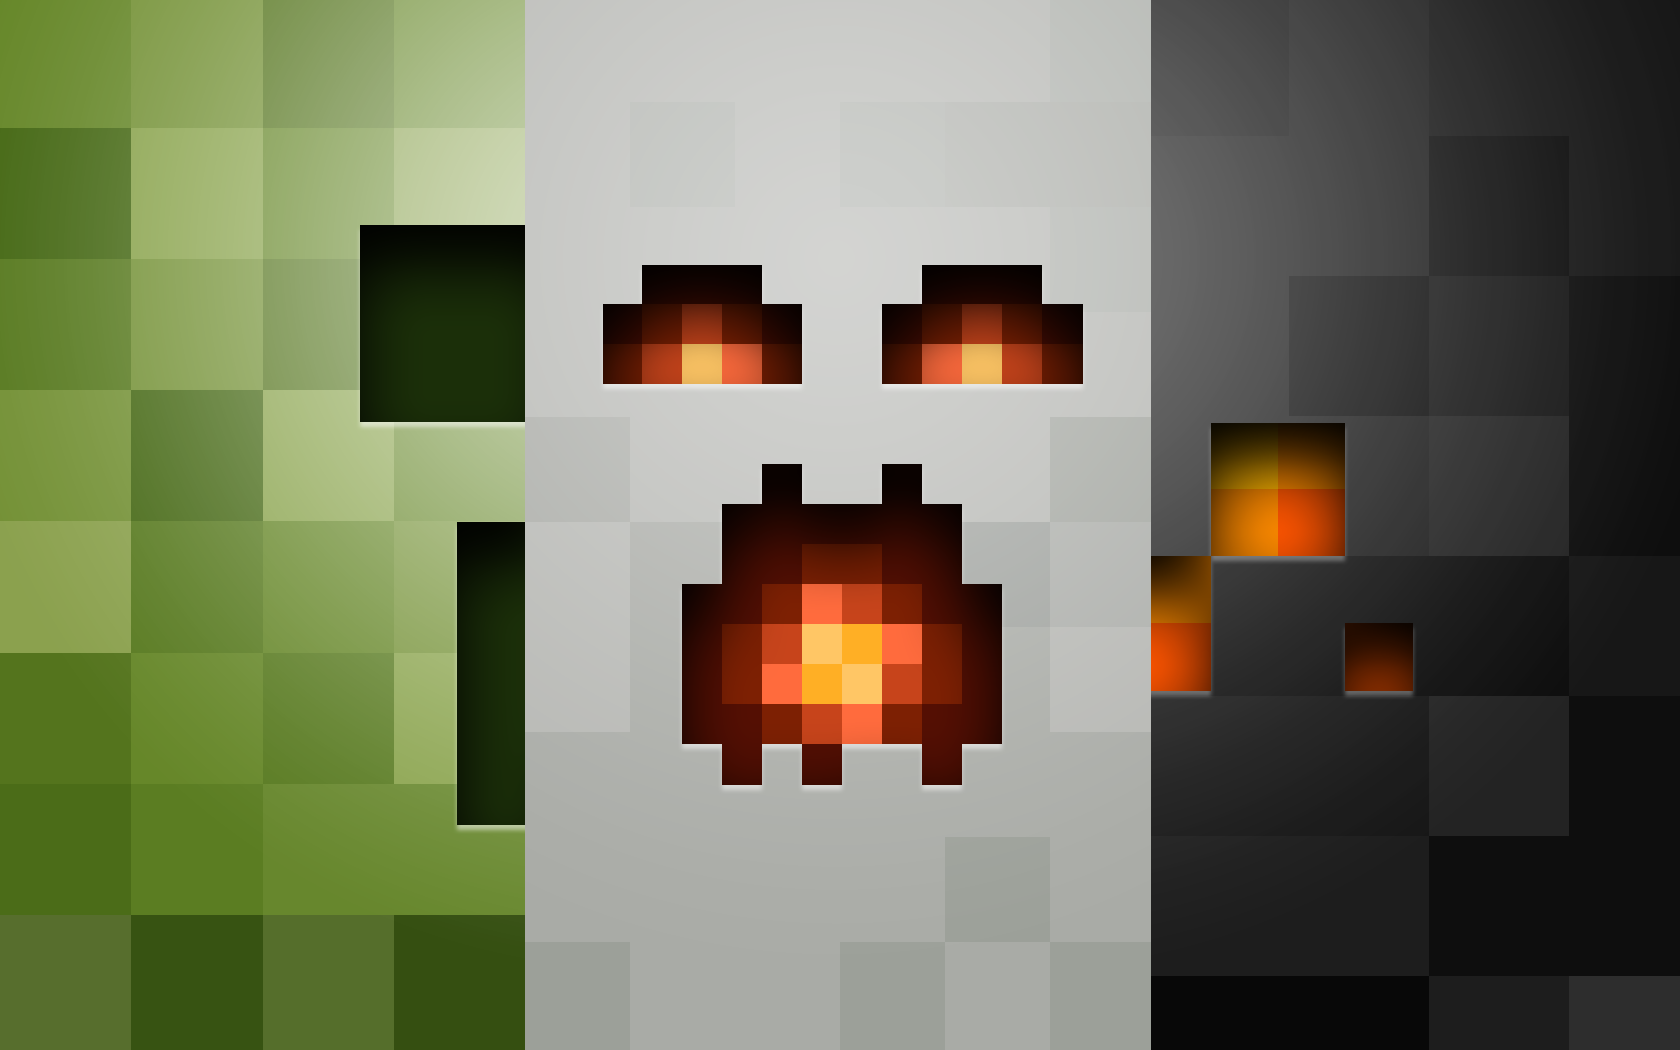 Minecraft Wallpapers by ClockWorkLemons